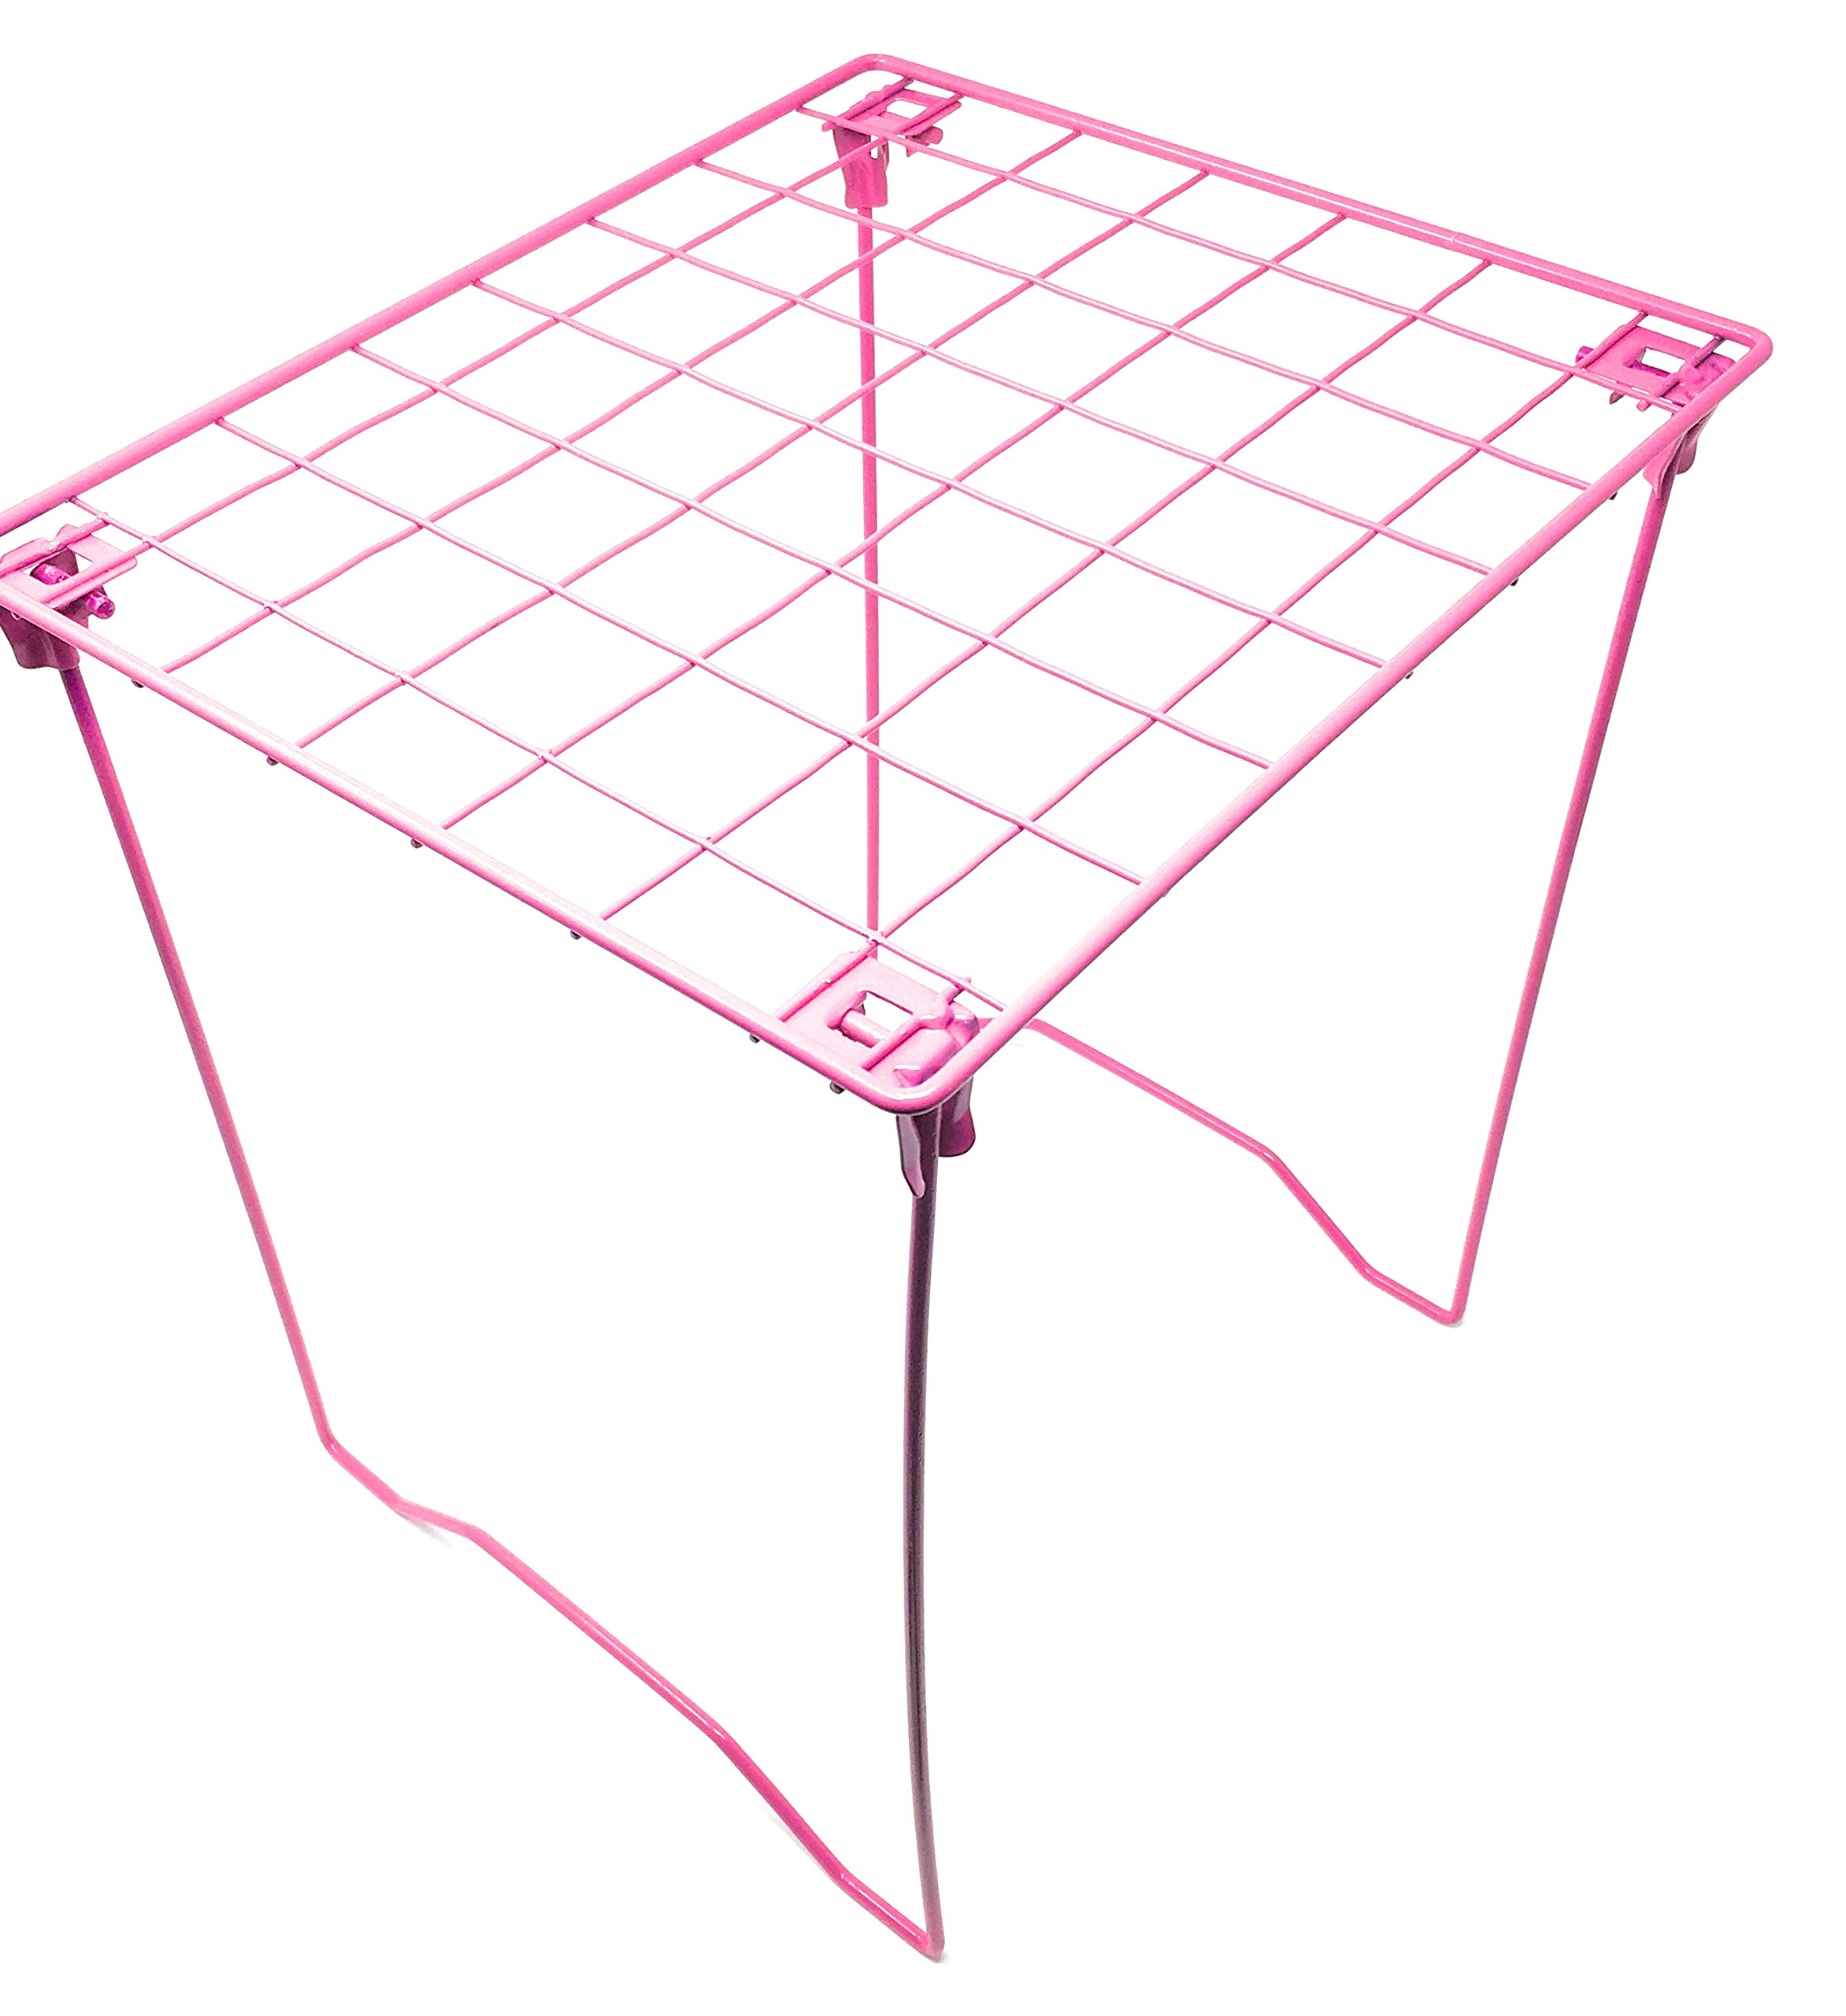 Hot Pink Locker Shelf - Foldable Stac Mate Shelf for Office, Home or School